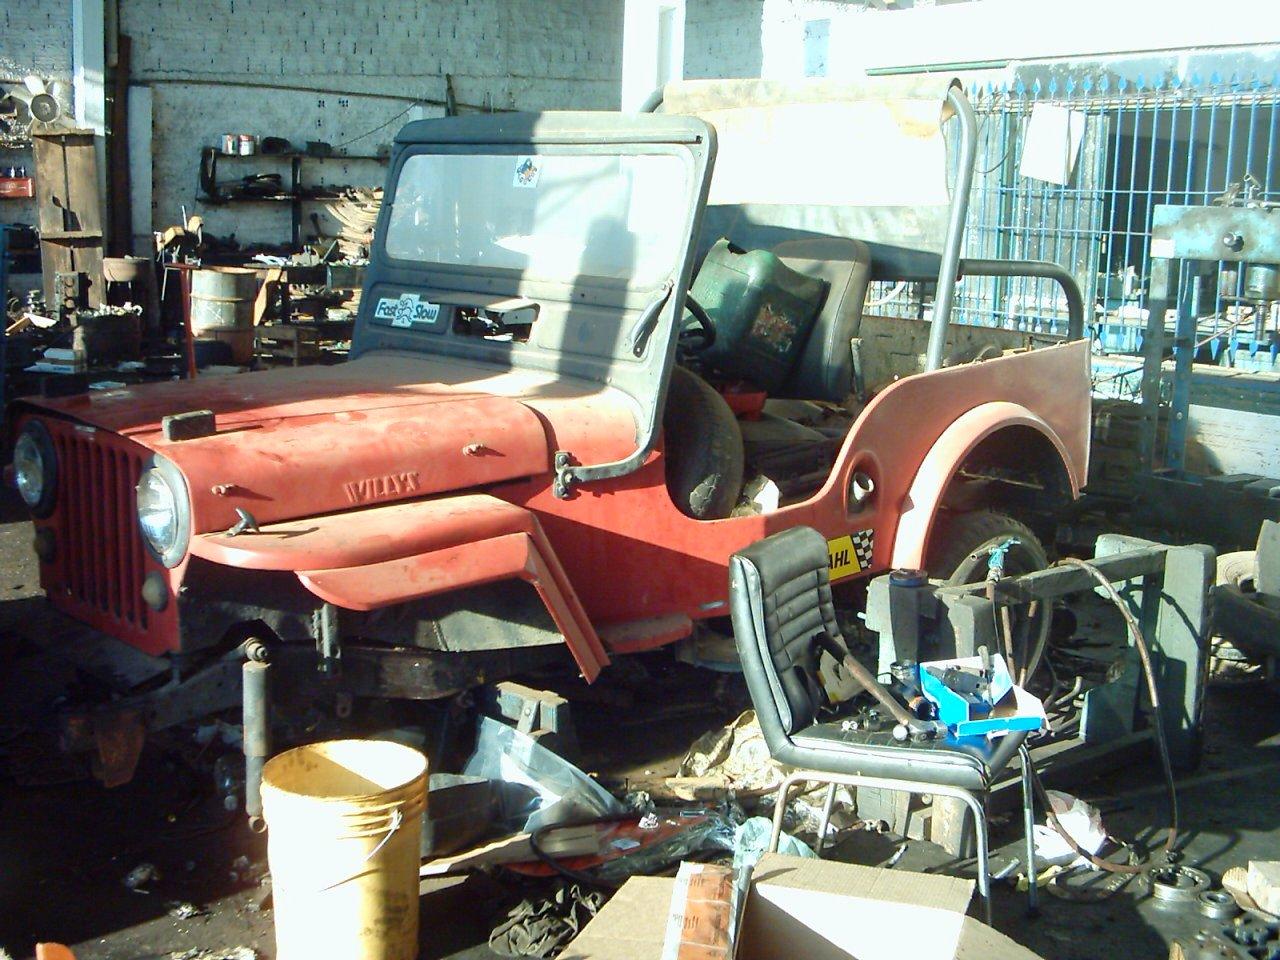 reinaldo-sigwald-s-josc3a9-d-campos-sp-jeep-1951-itararc3a9-sp Jeep Willys